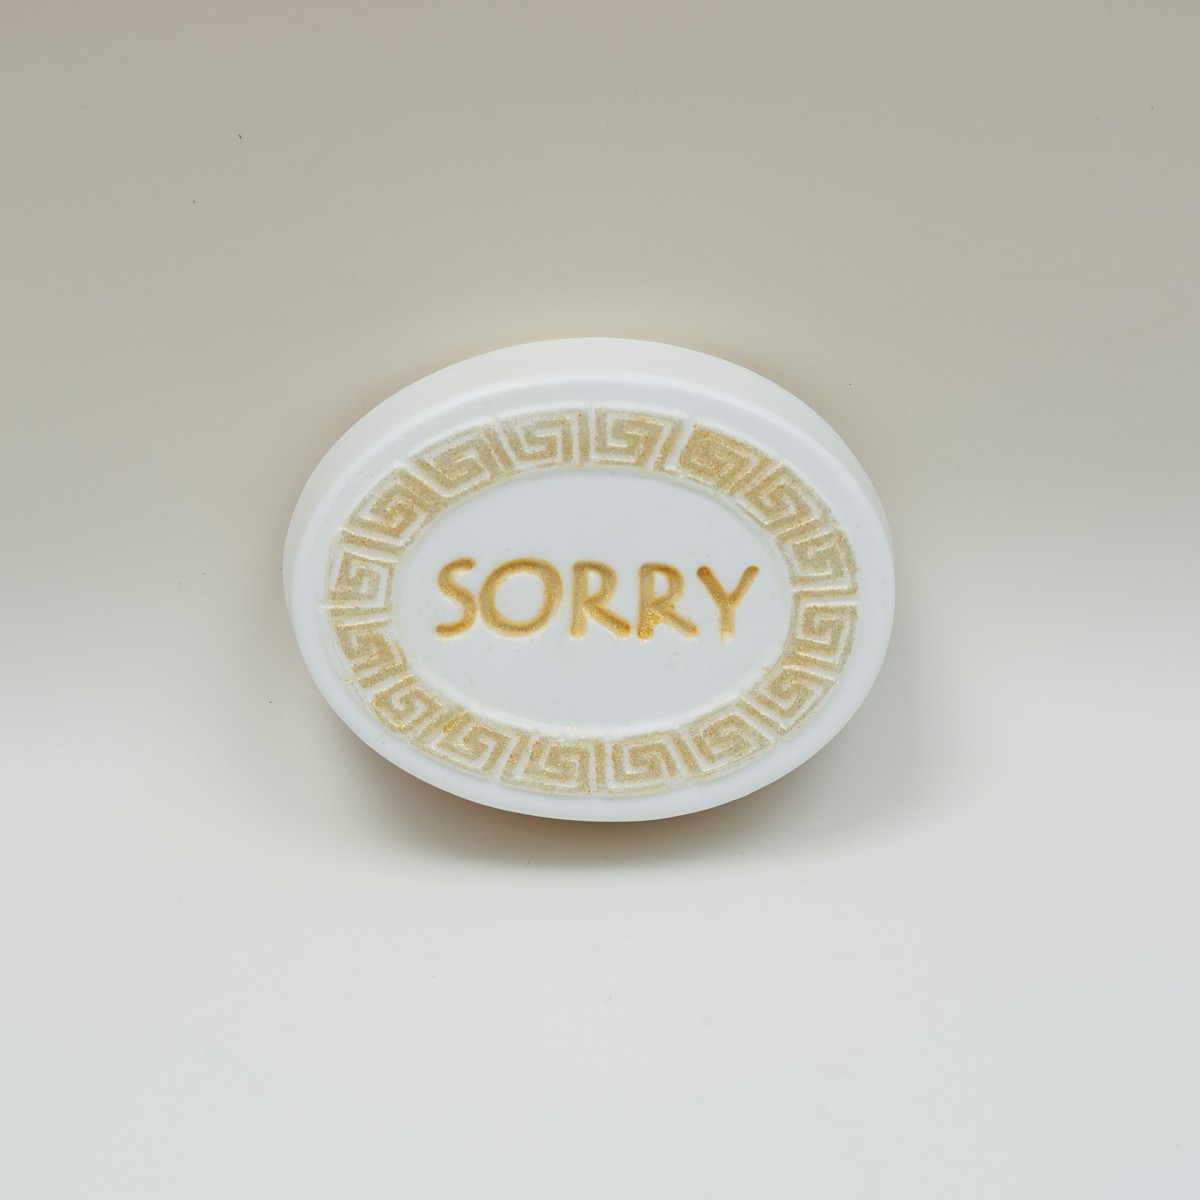 Foto 1 - SB SORRY